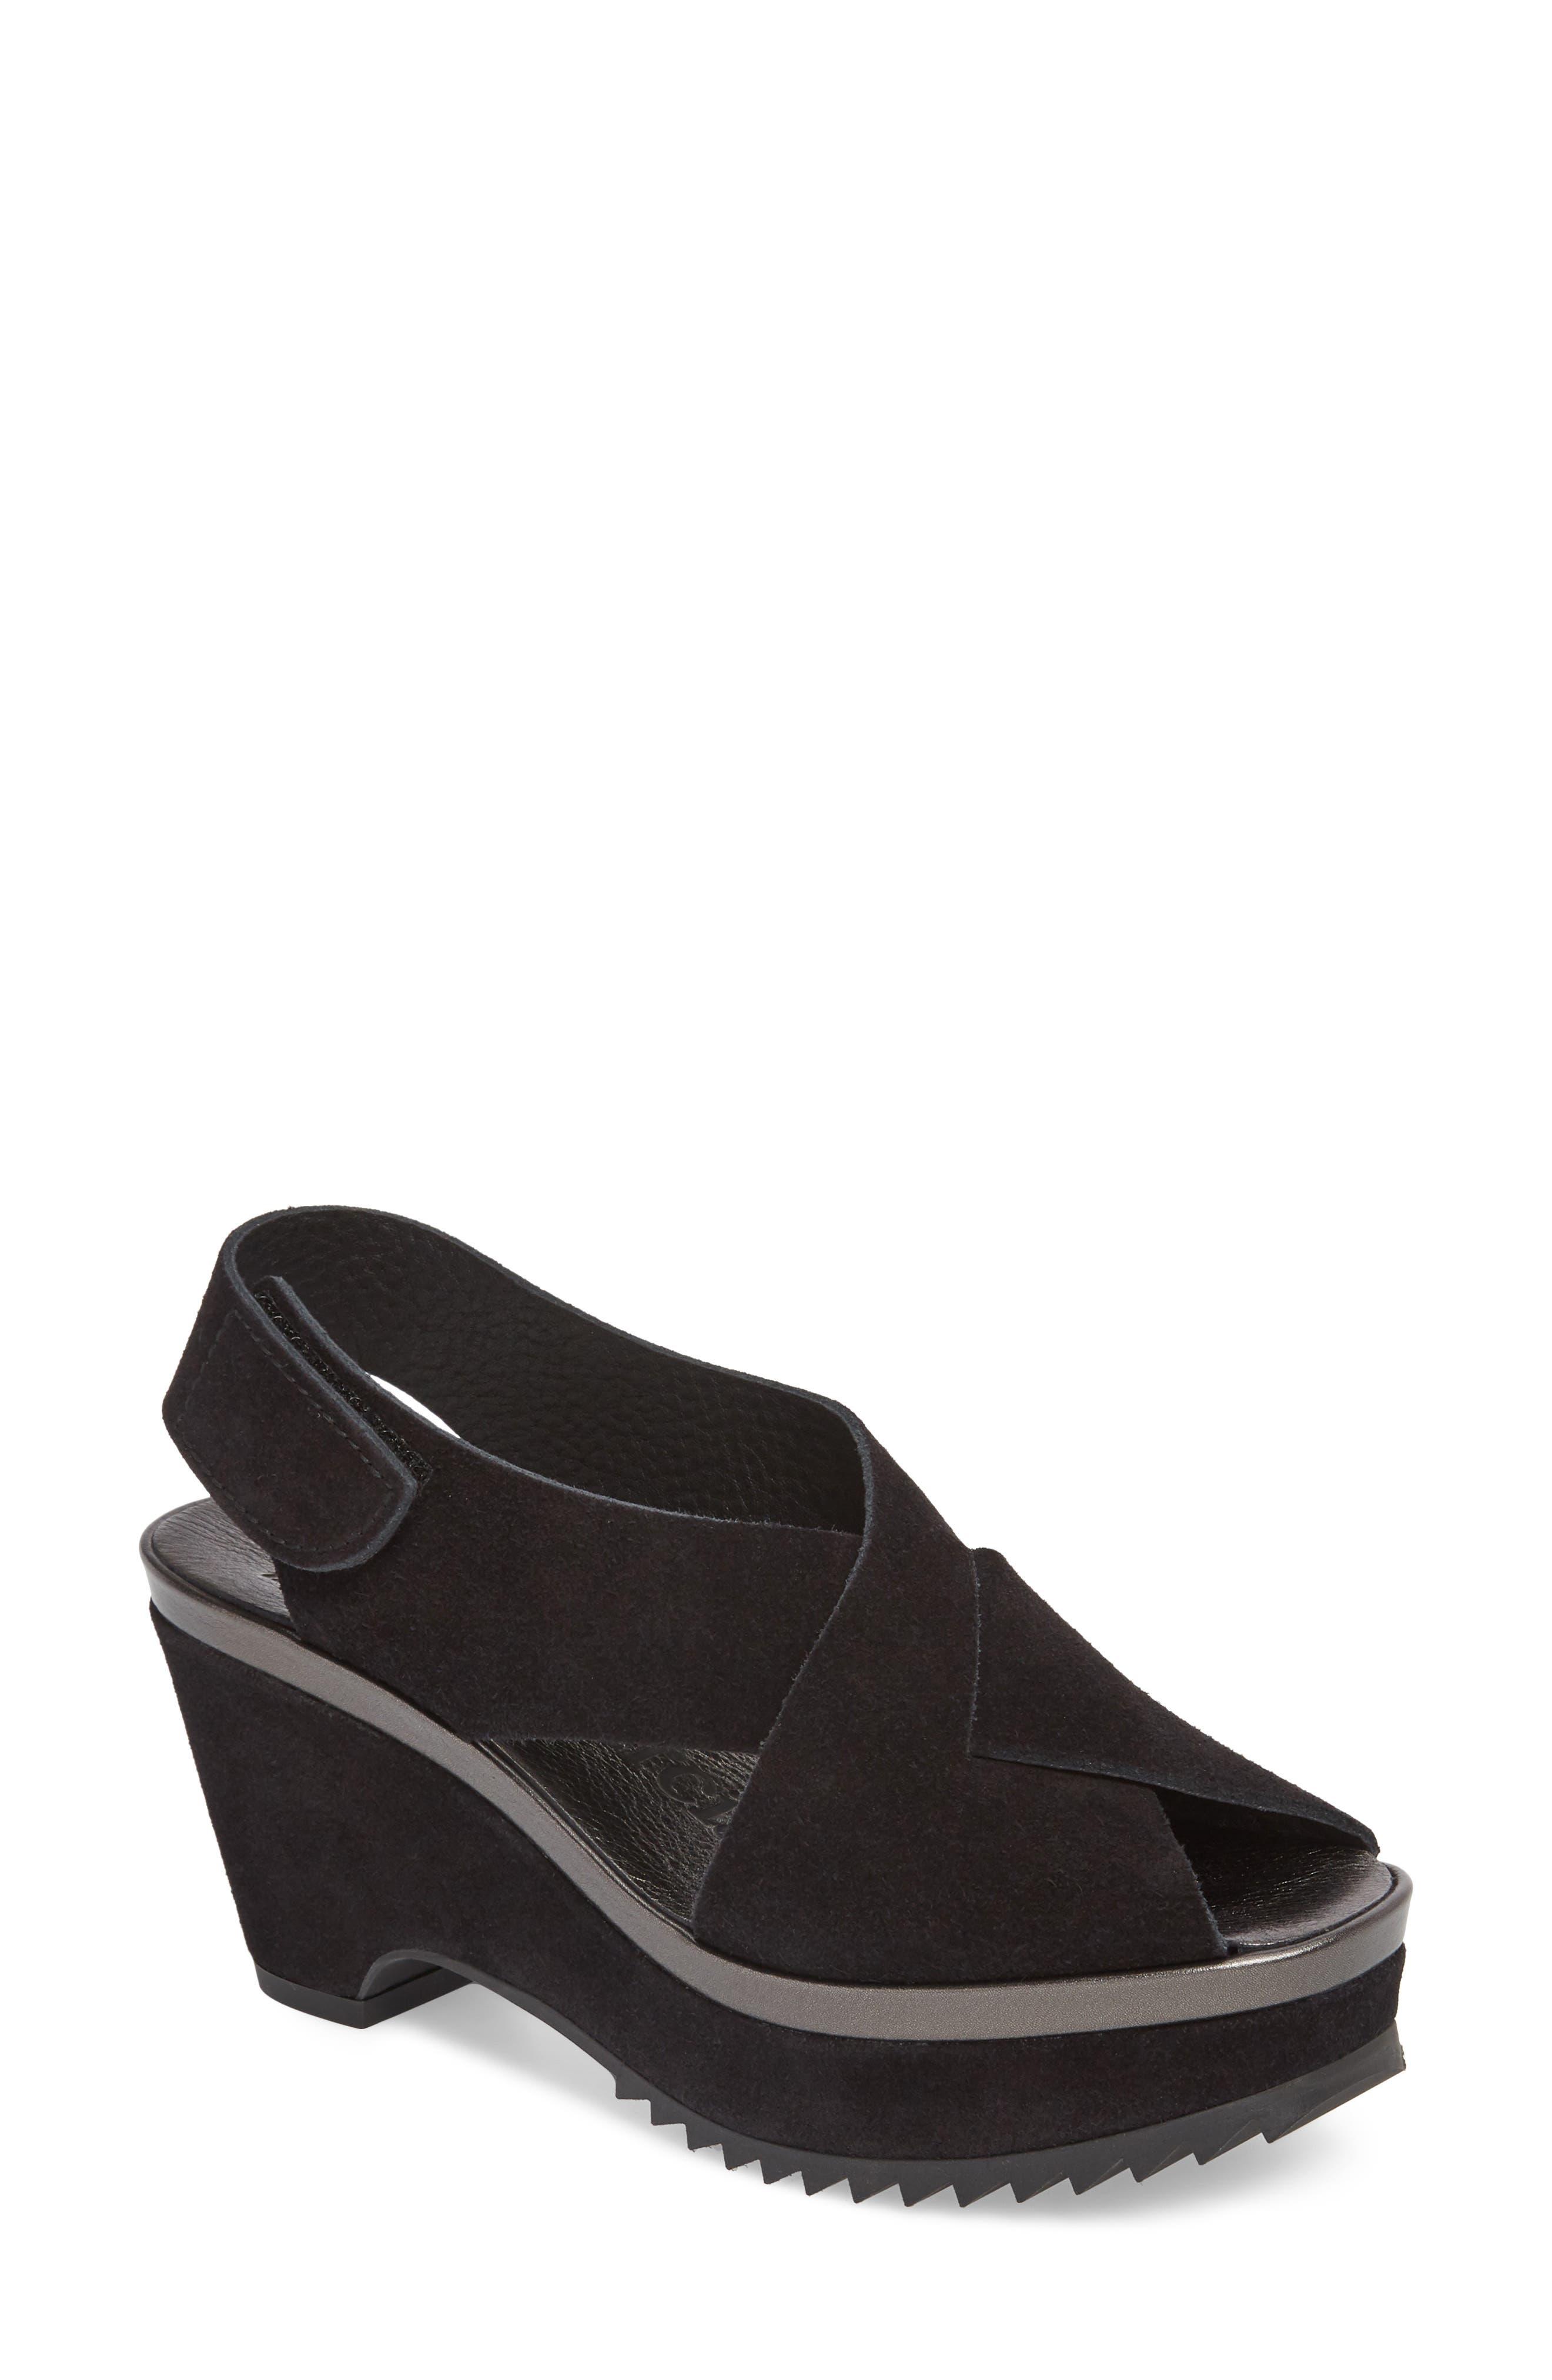 Fayre Cross Strap Wedge Sandal,                         Main,                         color, BLACK